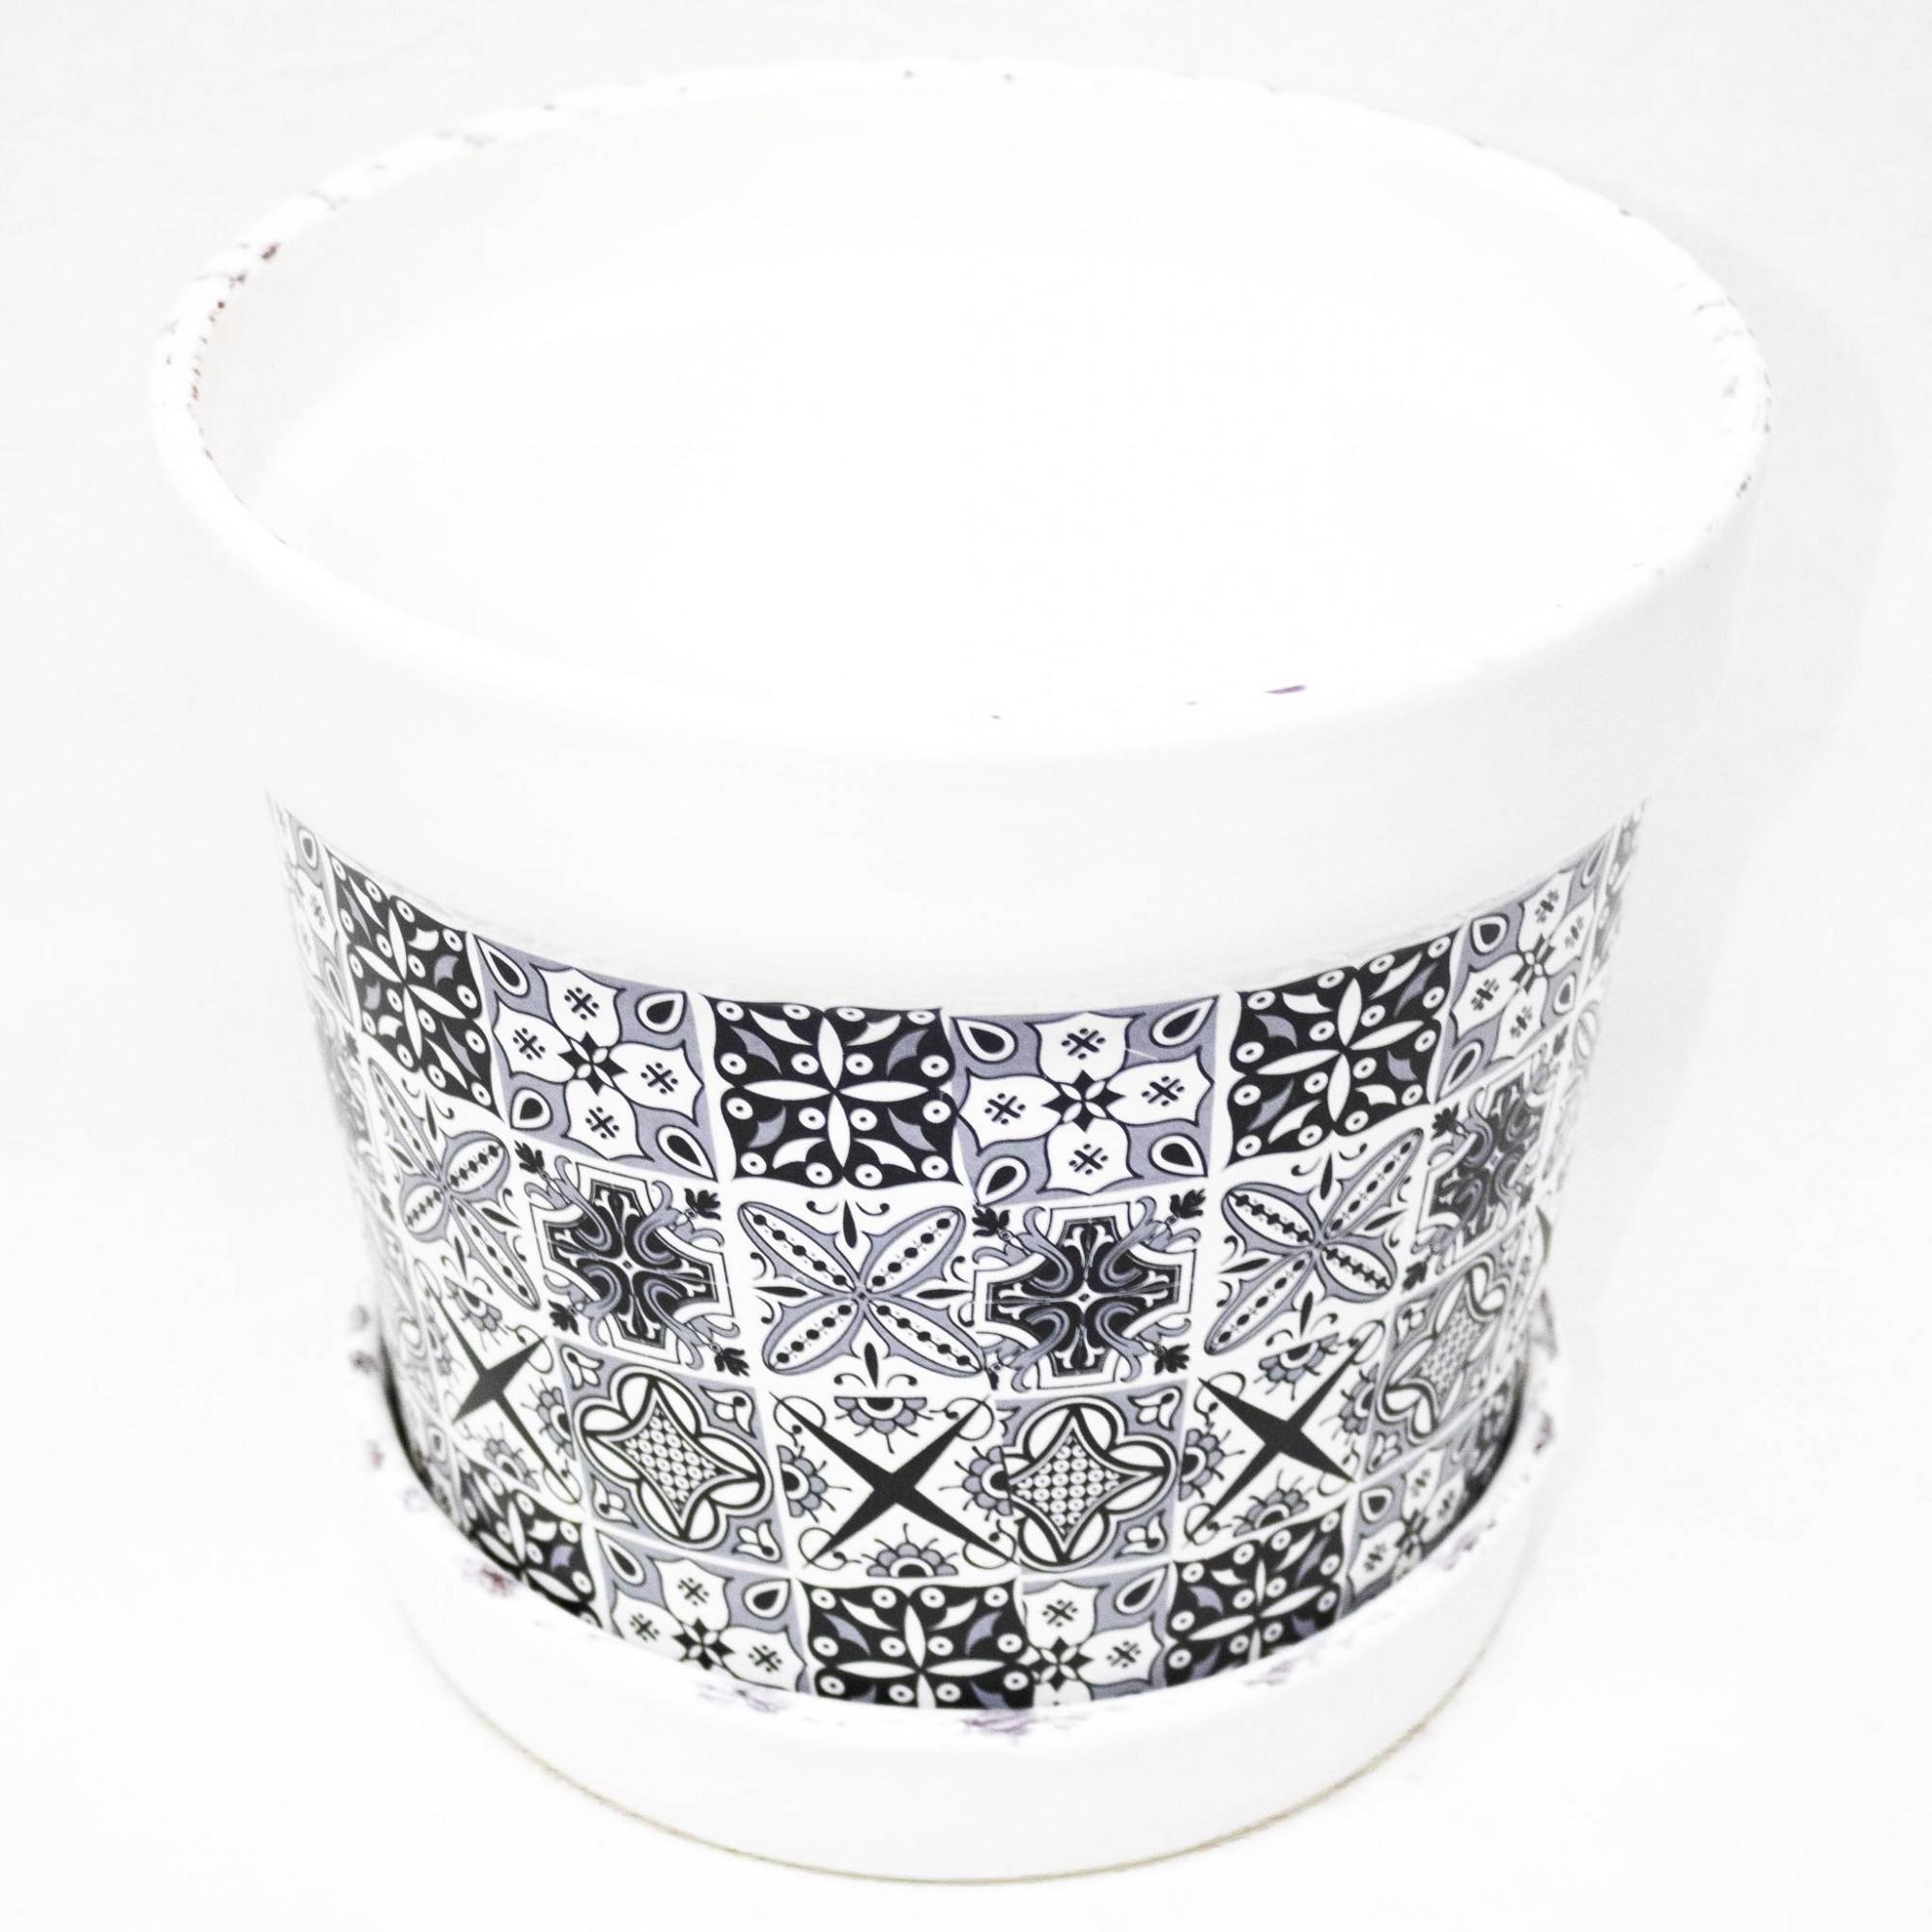 Cachepô Redondo C/ Borda - Cerâmica